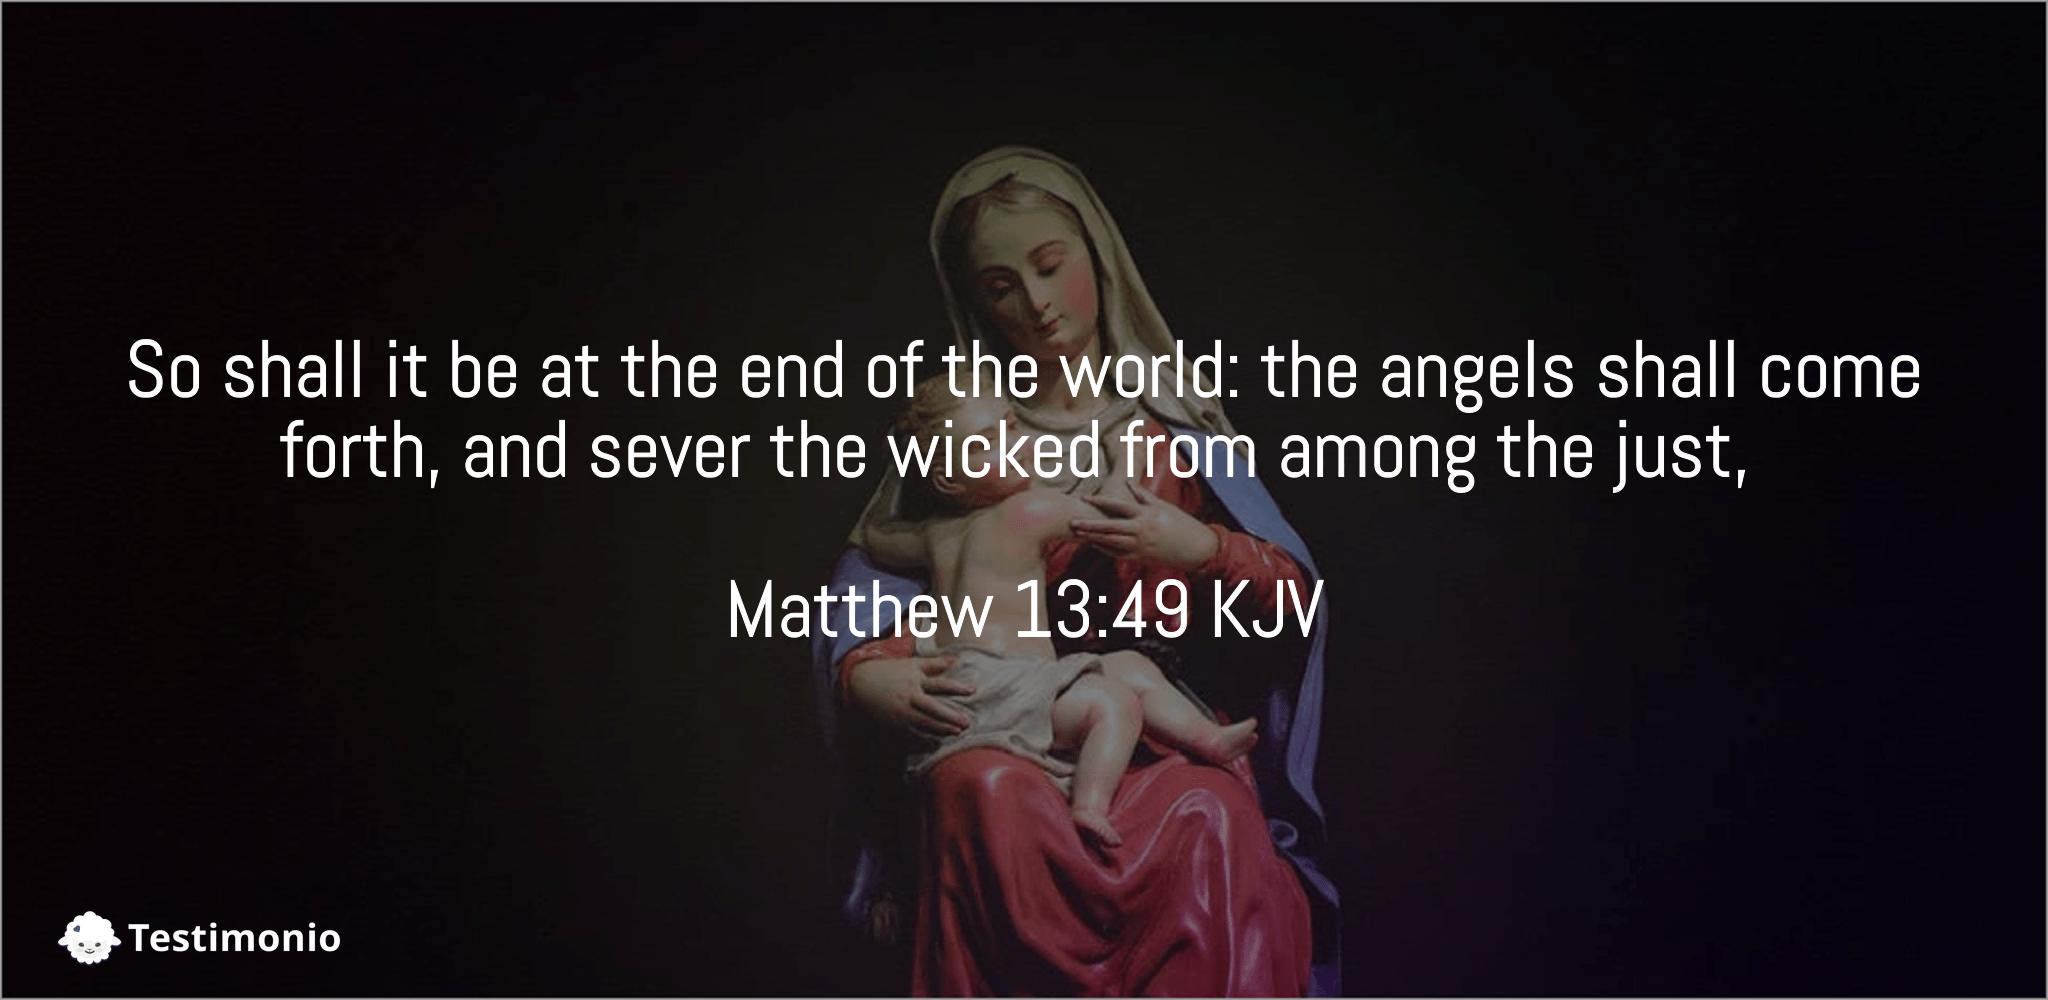 Matthew 13:49